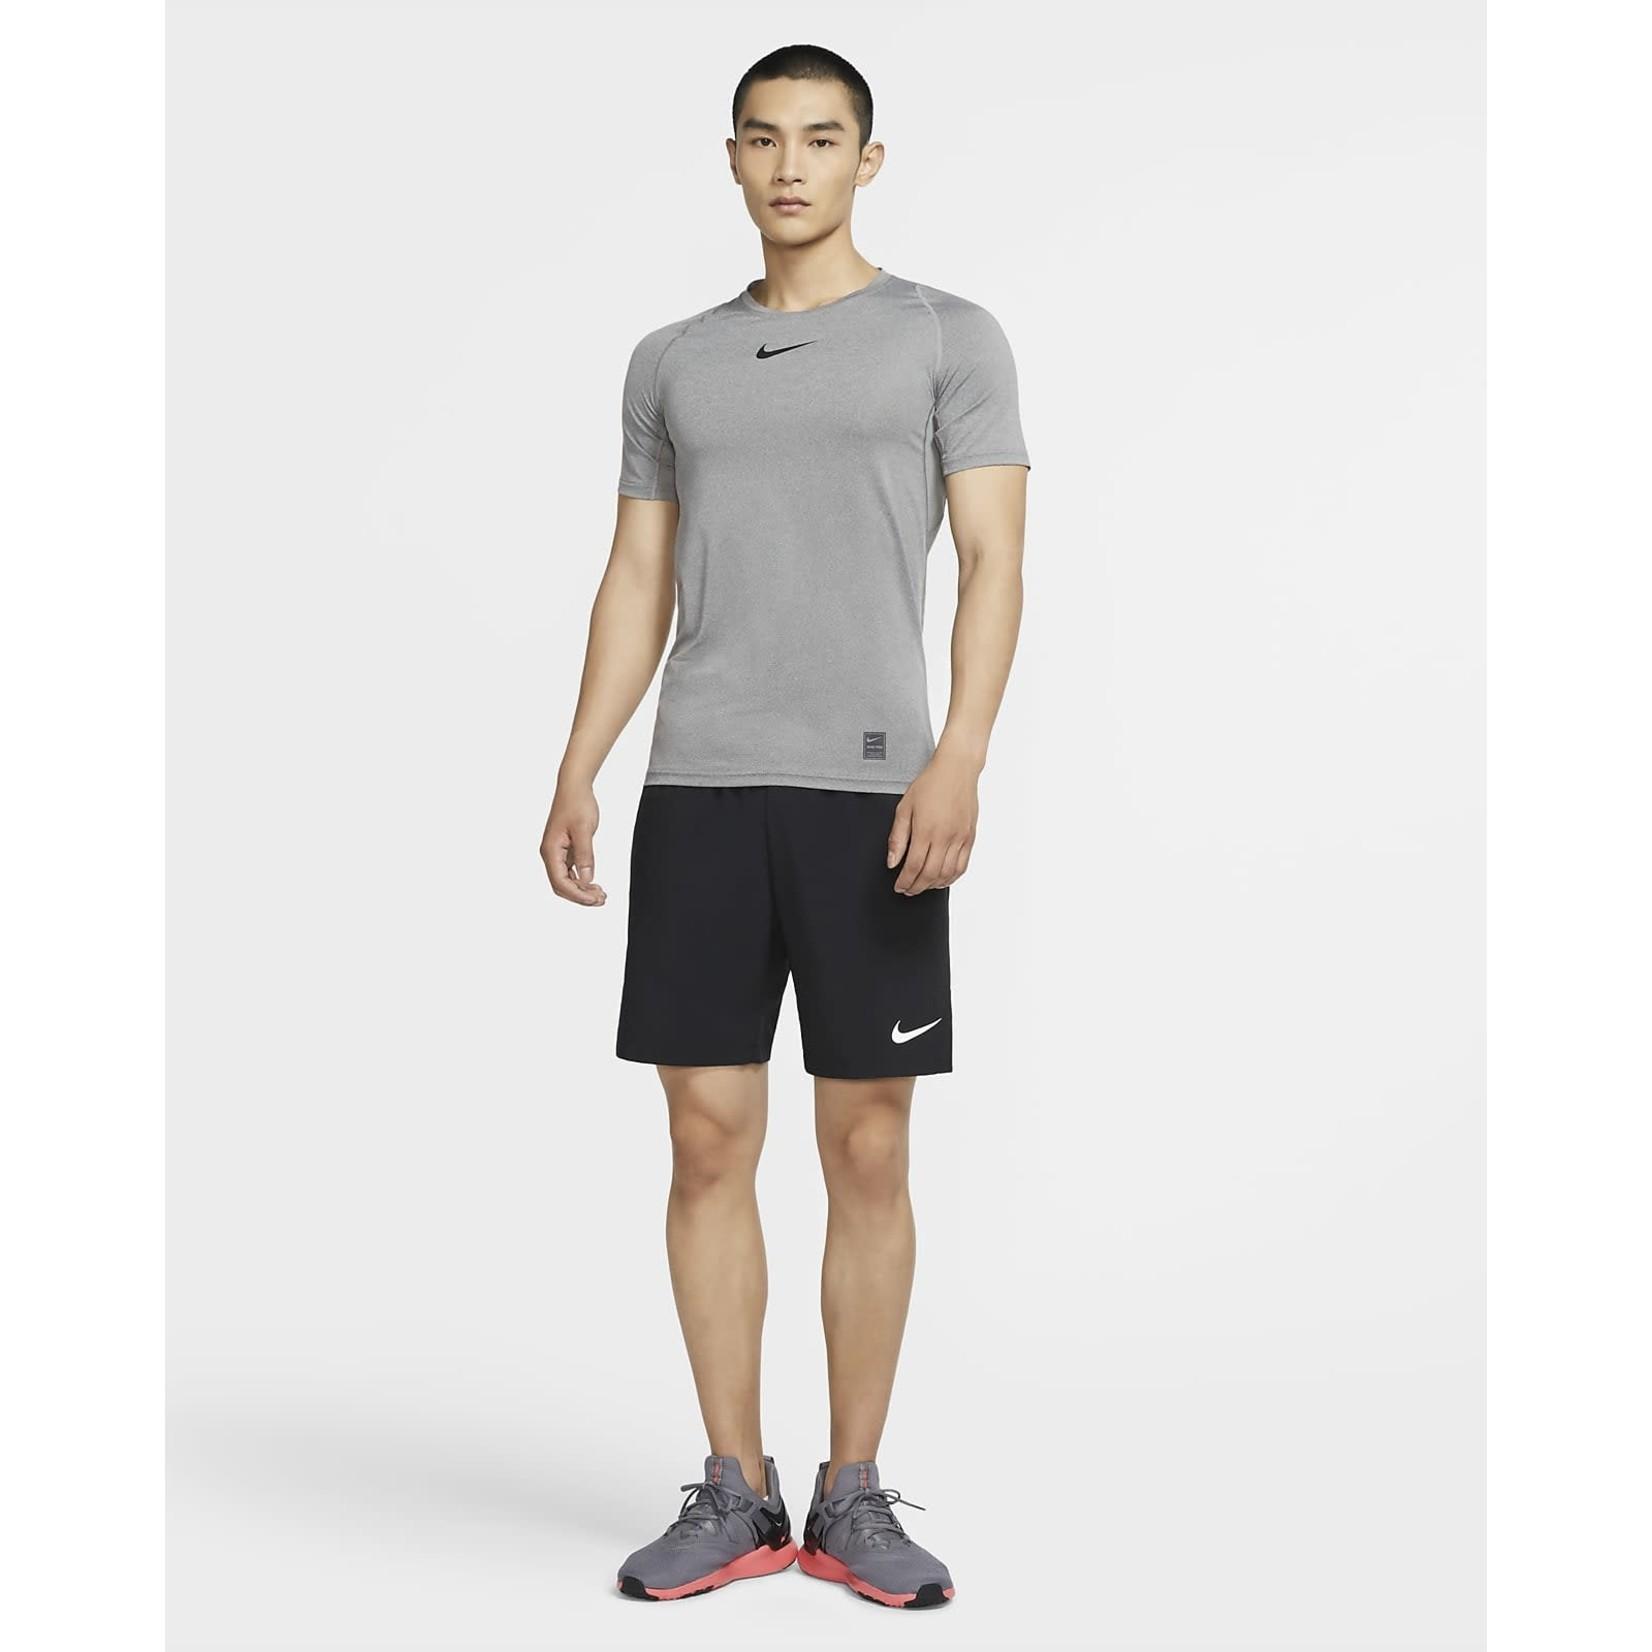 Nike Nike Shorts, Flex Woven 3.0, Mens